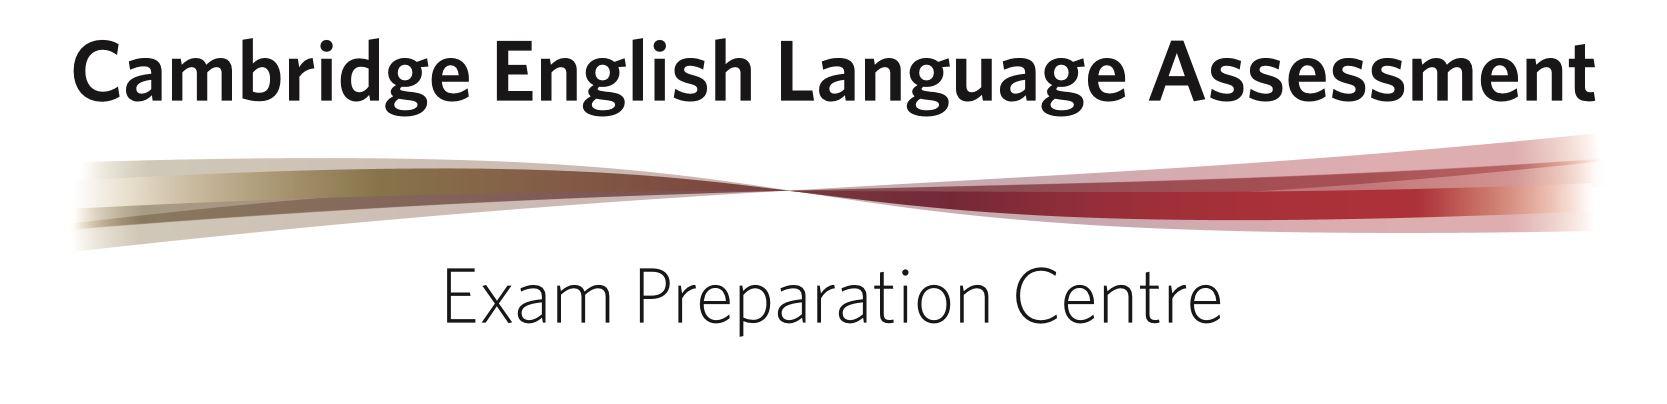 Cambridge BULATS Certification - Direct English